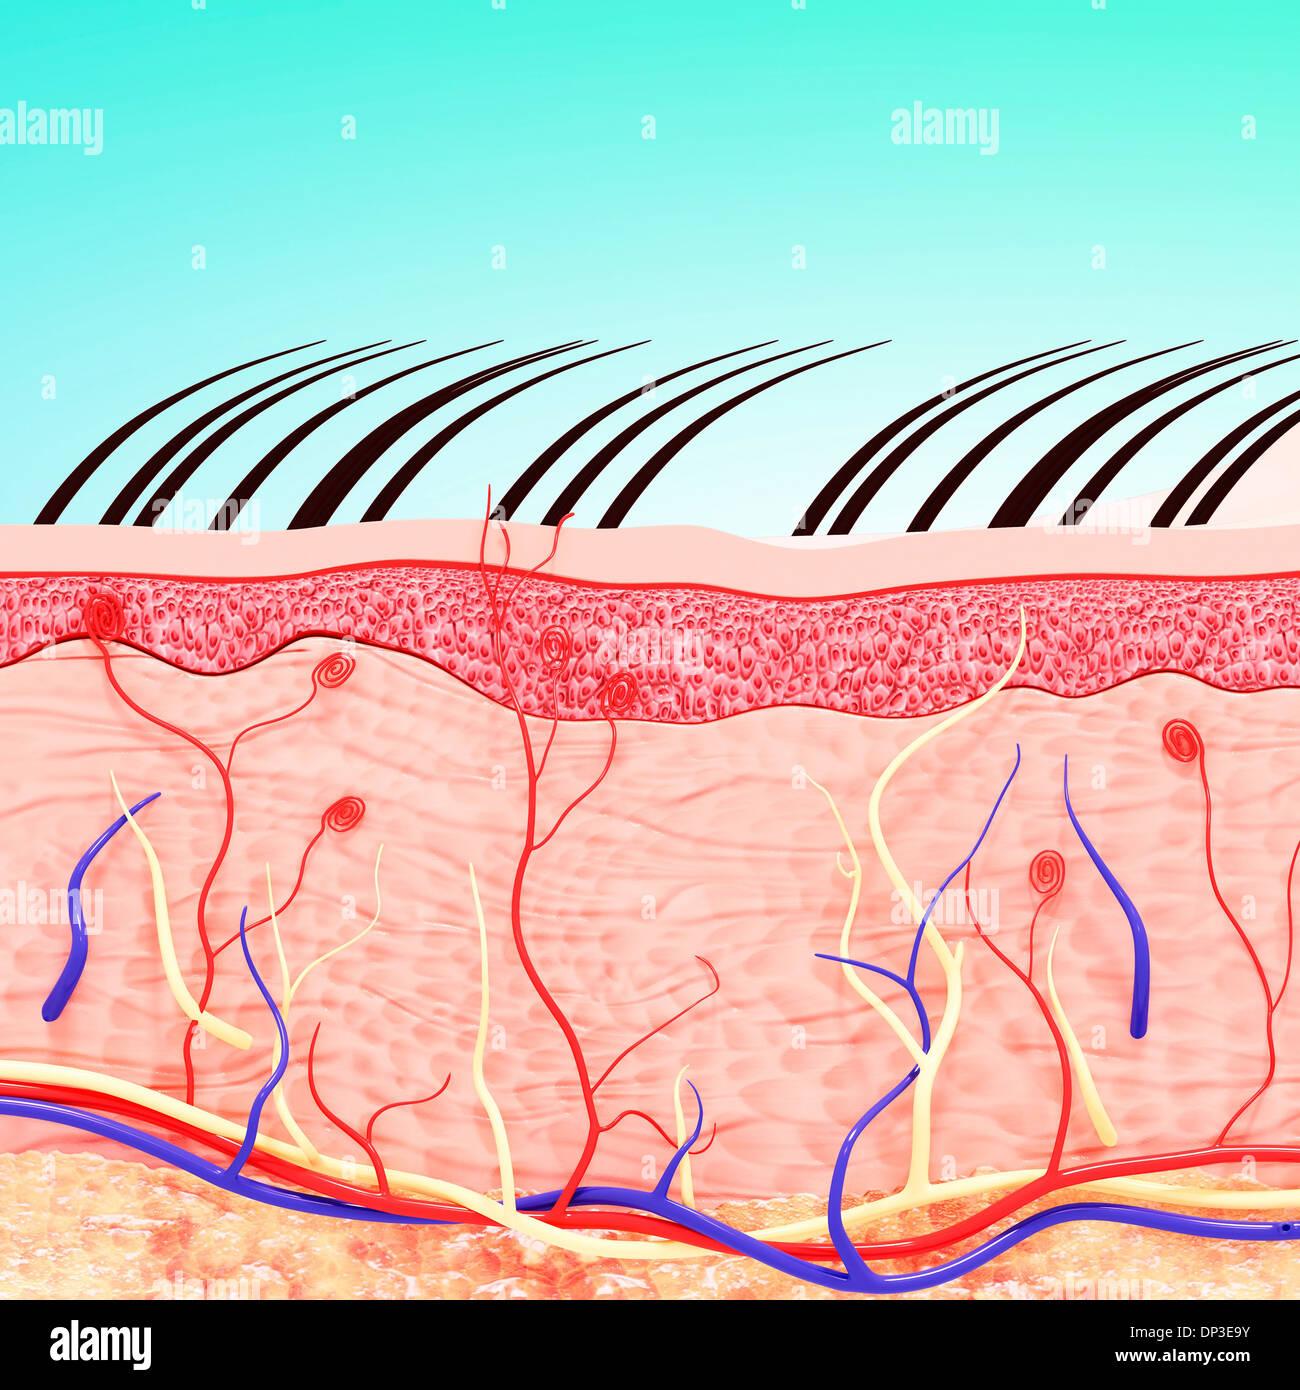 La pelle umana anatomia, artwork Immagini Stock